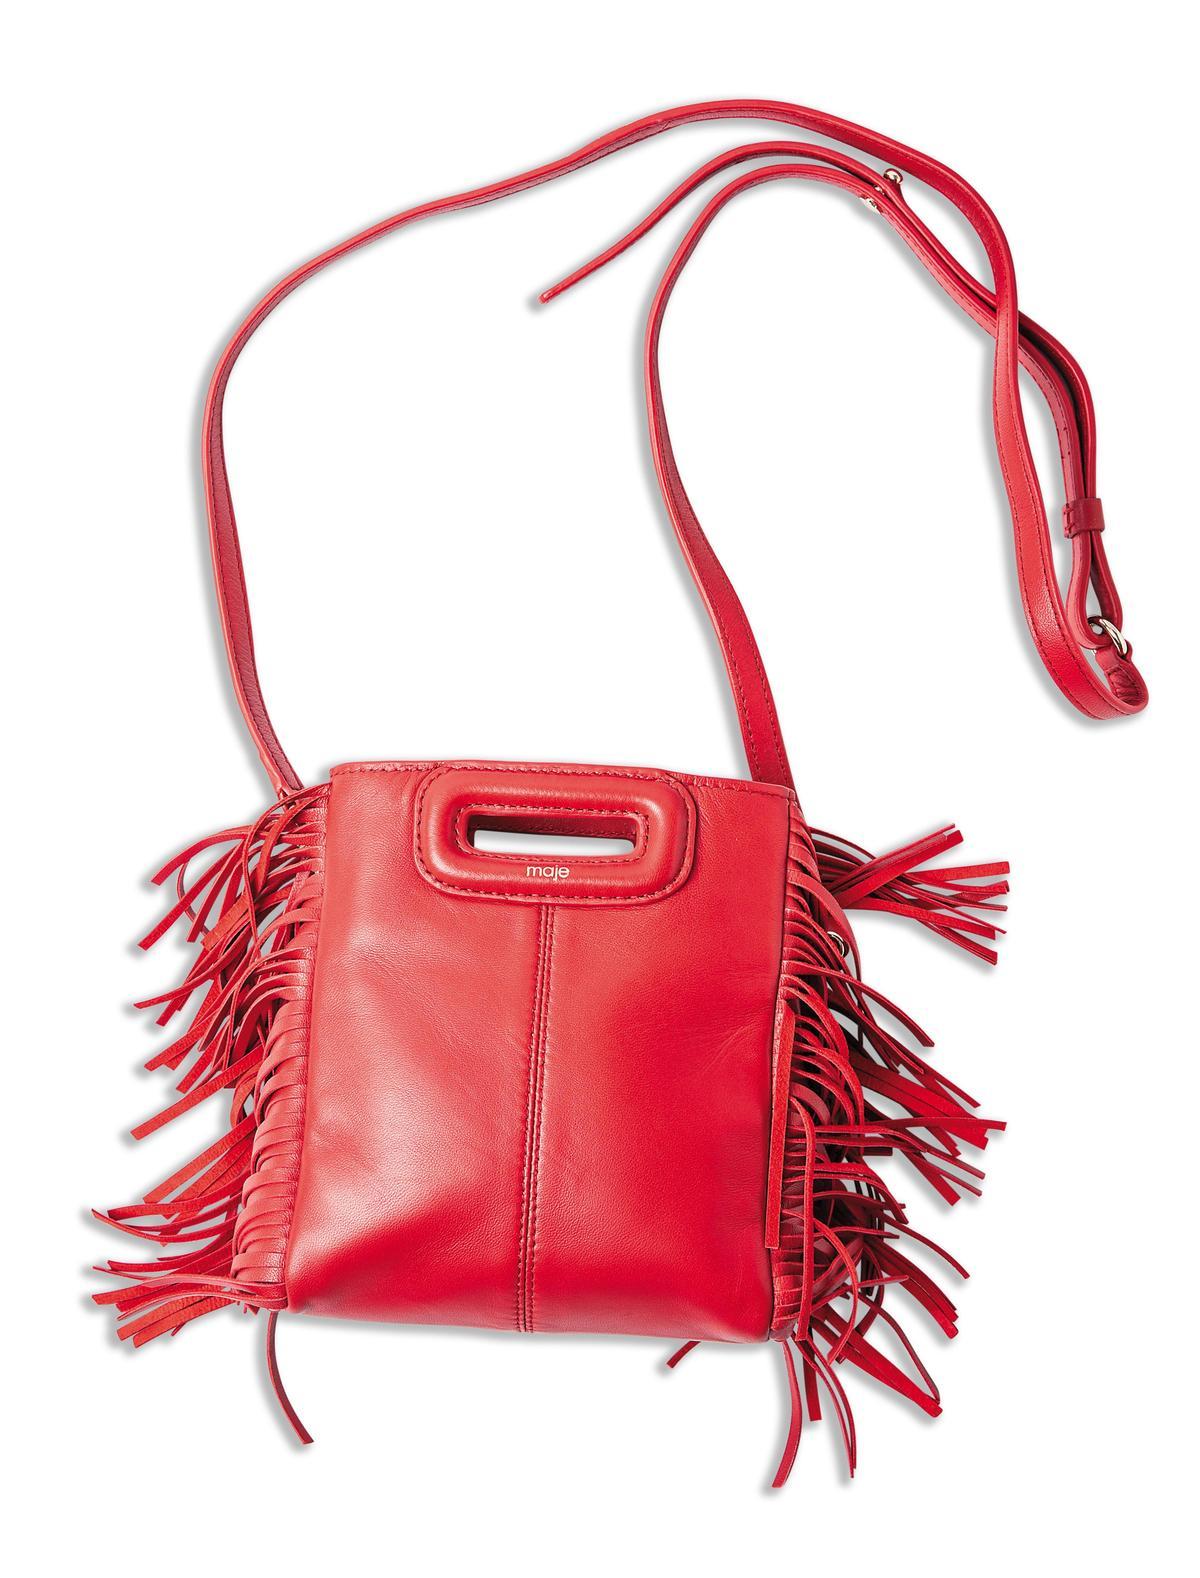 MAJE紅色流蘇包。NT$8,120